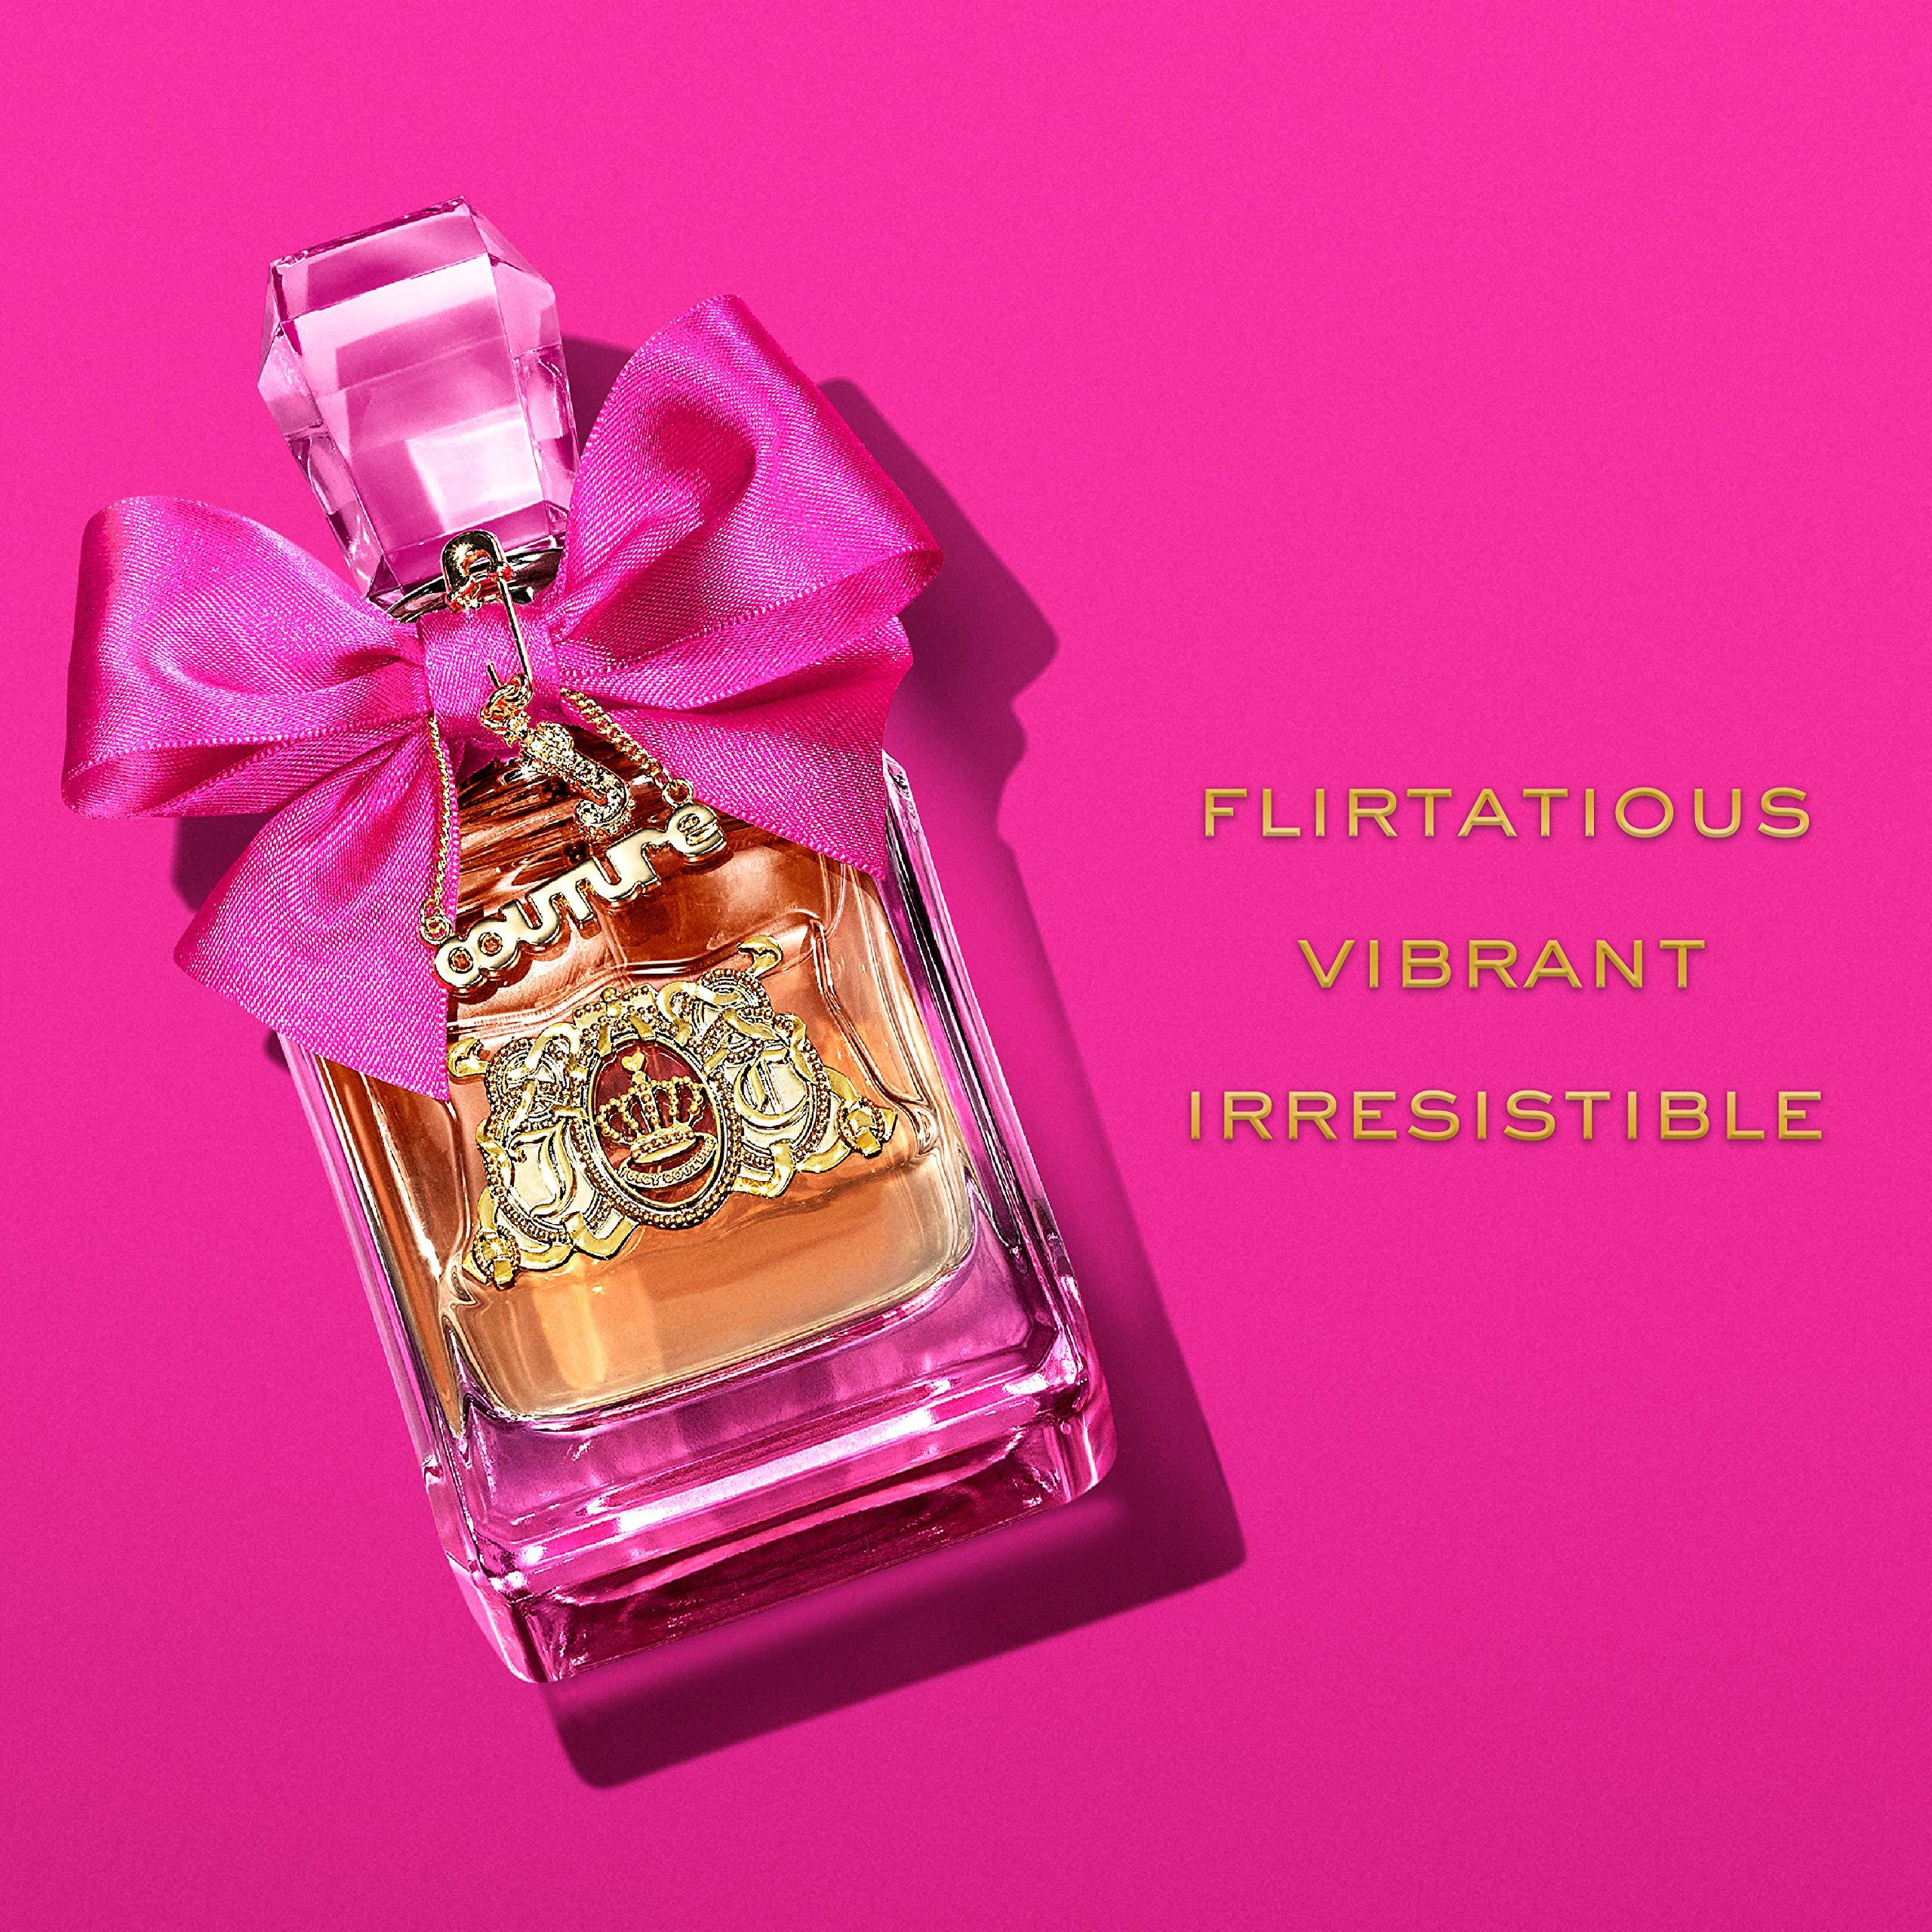 Juicy Couture Viva La Juicy Perfume for Women, 1.0 fl. oz.  EDP by Juicy Couture (Image #3)